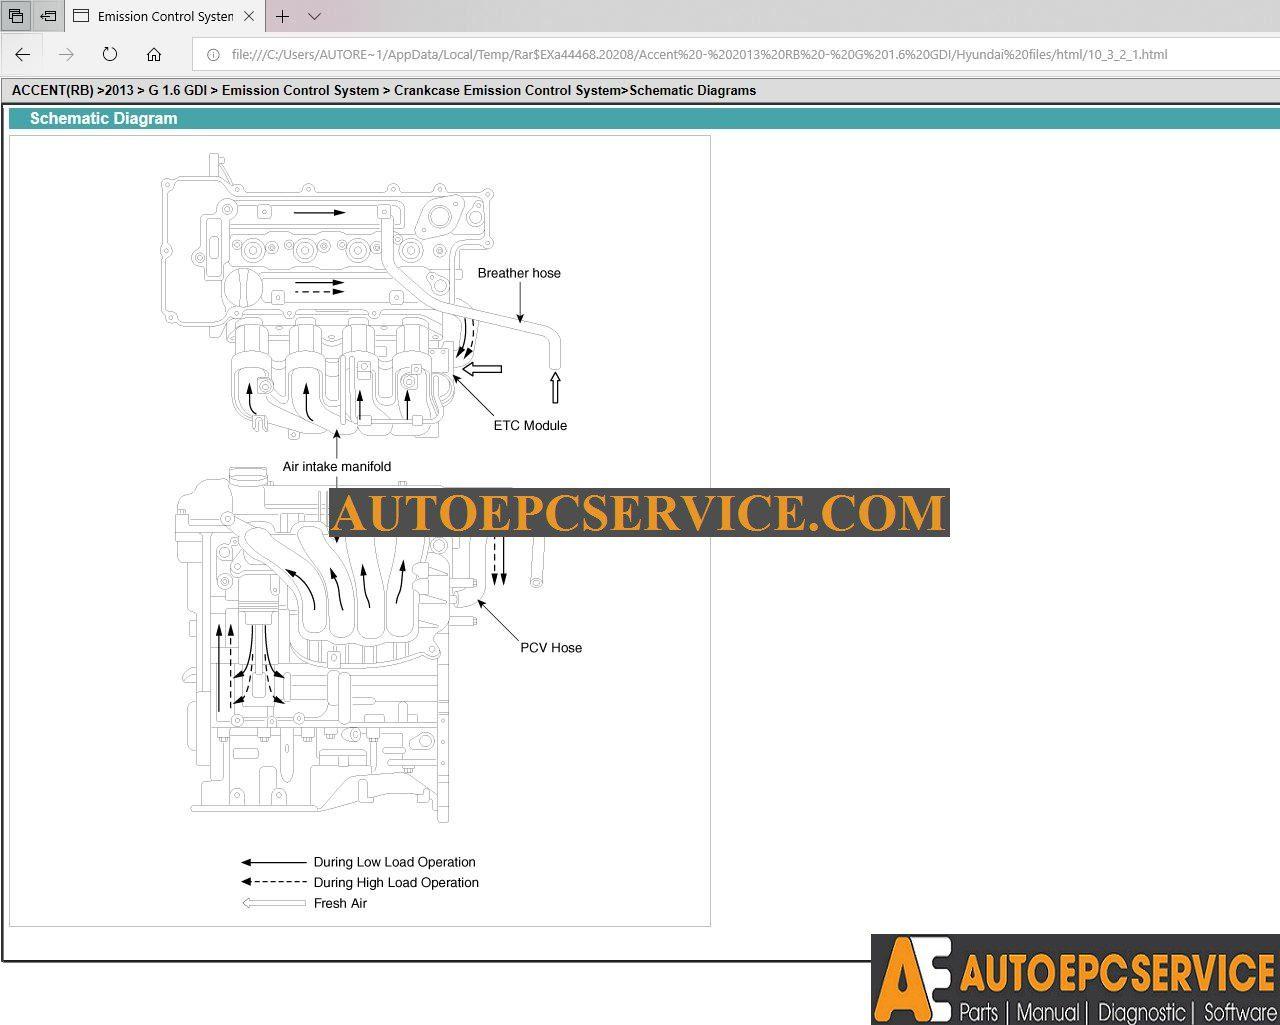 2000 hummer h1 wiring diagram hyundai workshop manual wiring diagram  2000 2013  dvd auto  hyundai workshop manual wiring diagram